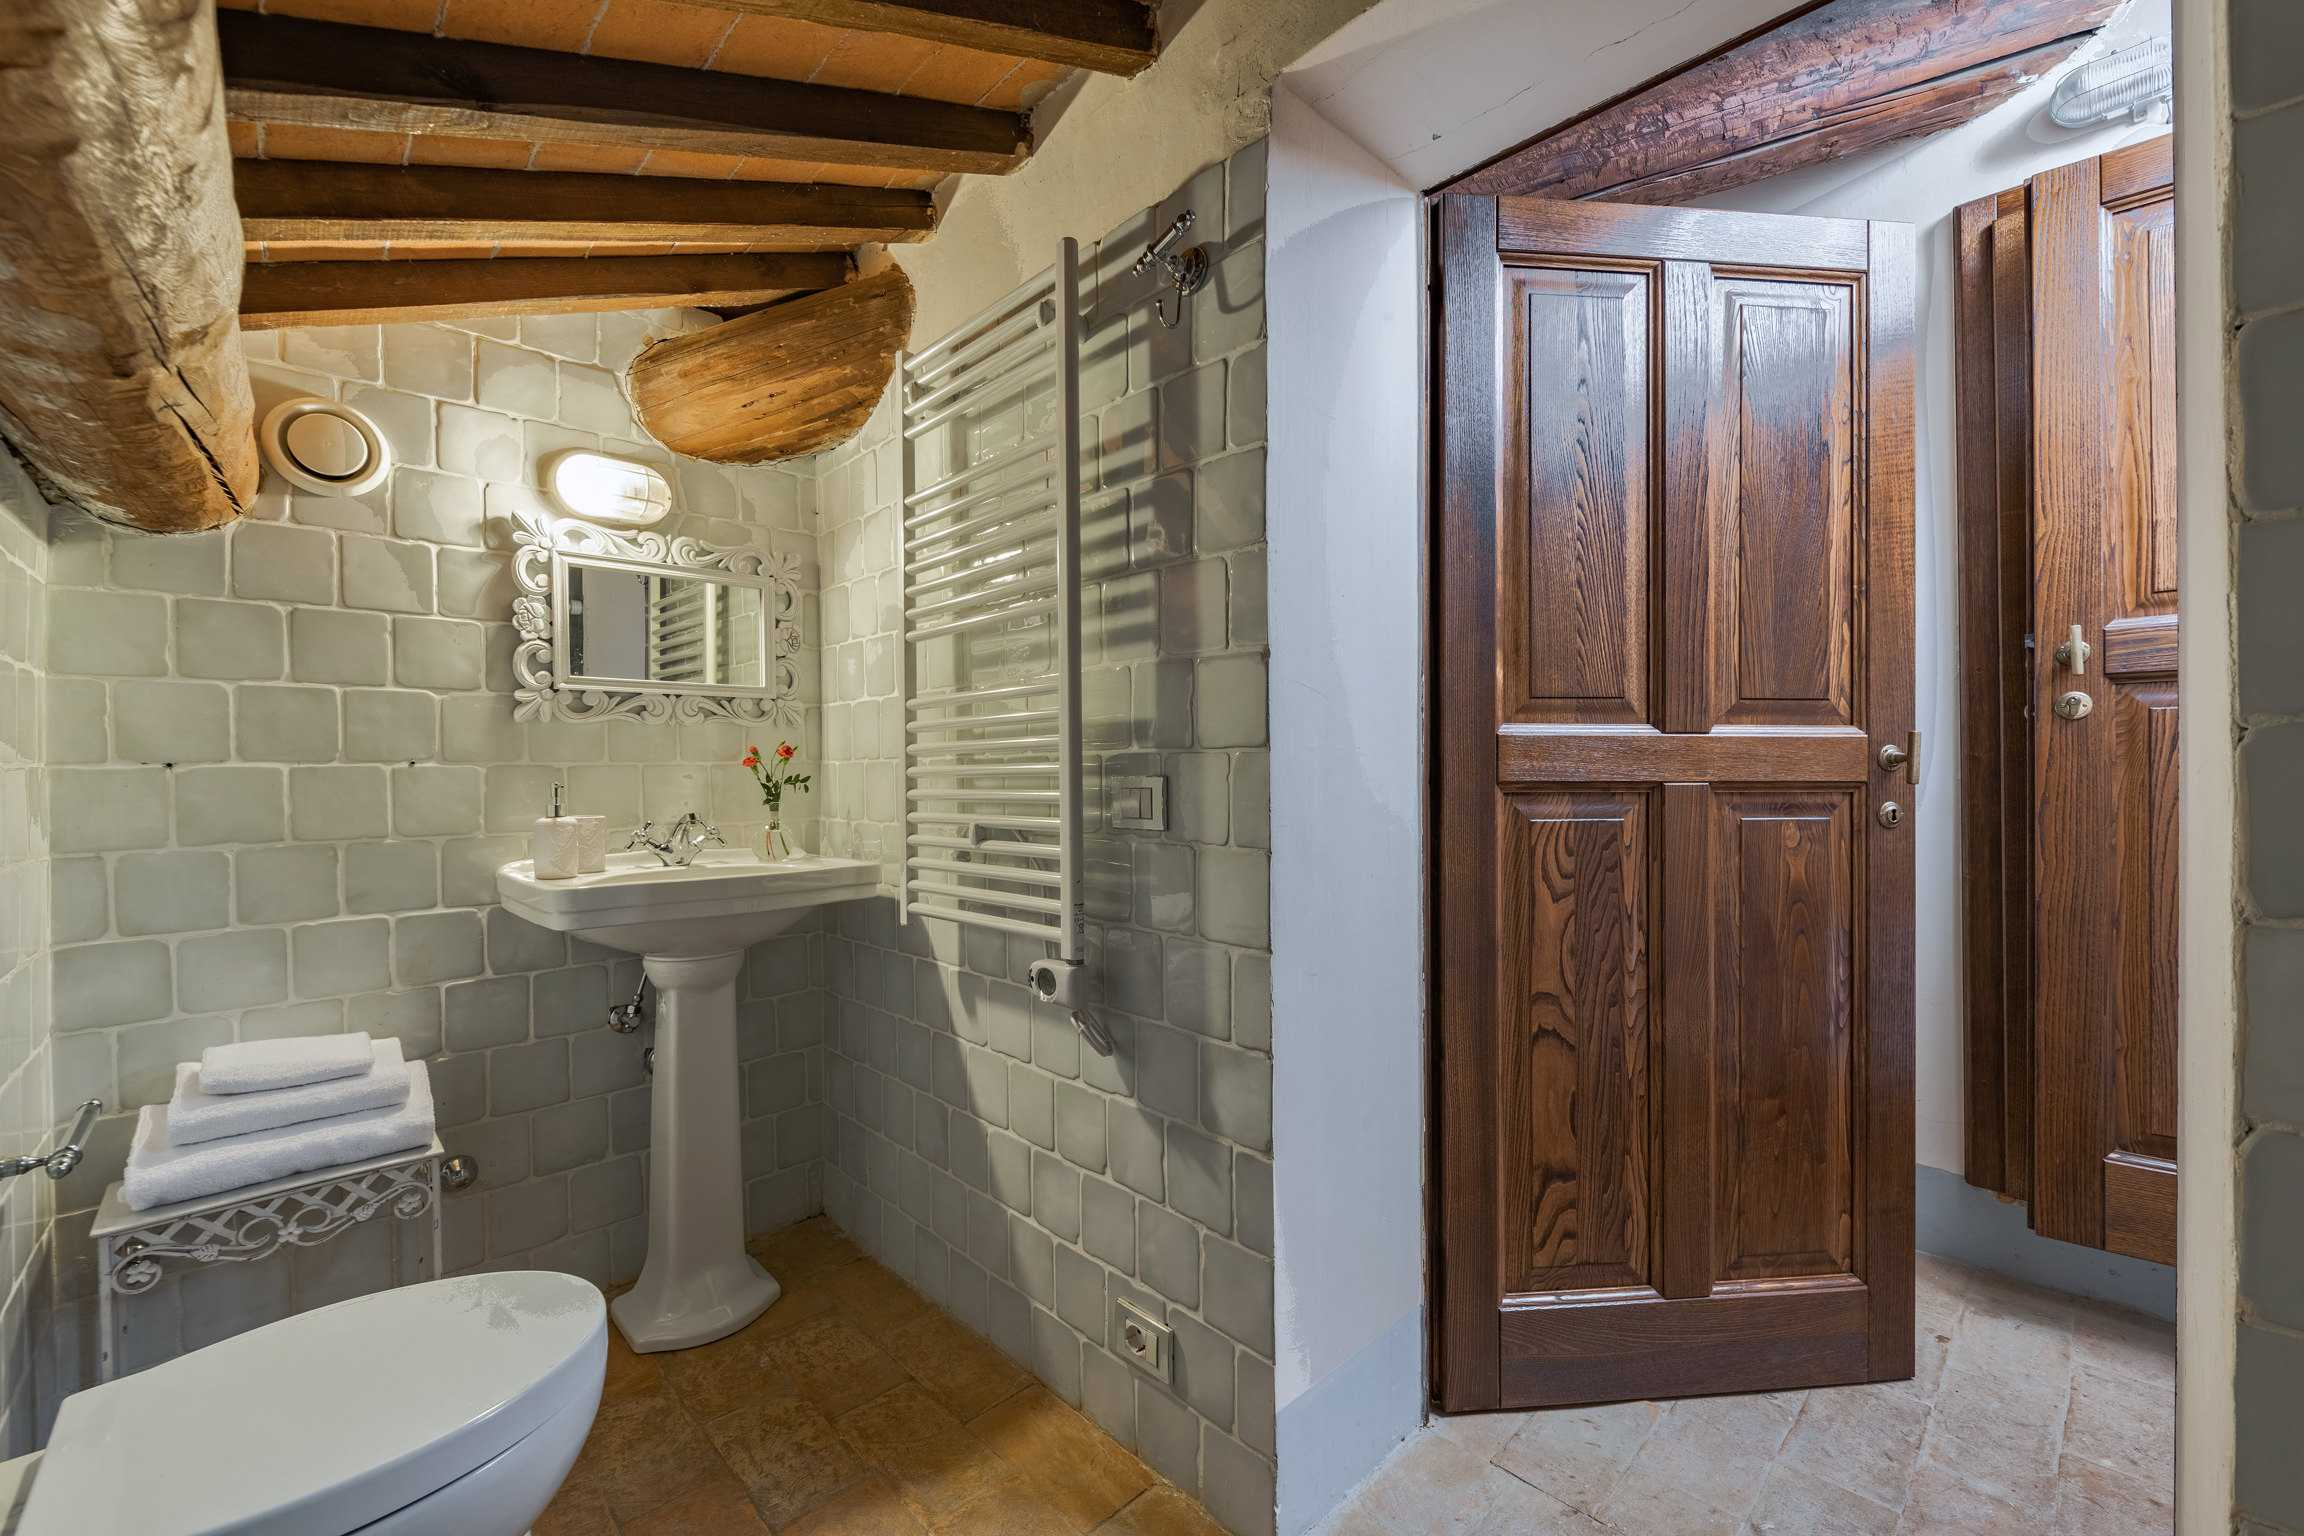 Villa de' Michelangioli badkamer